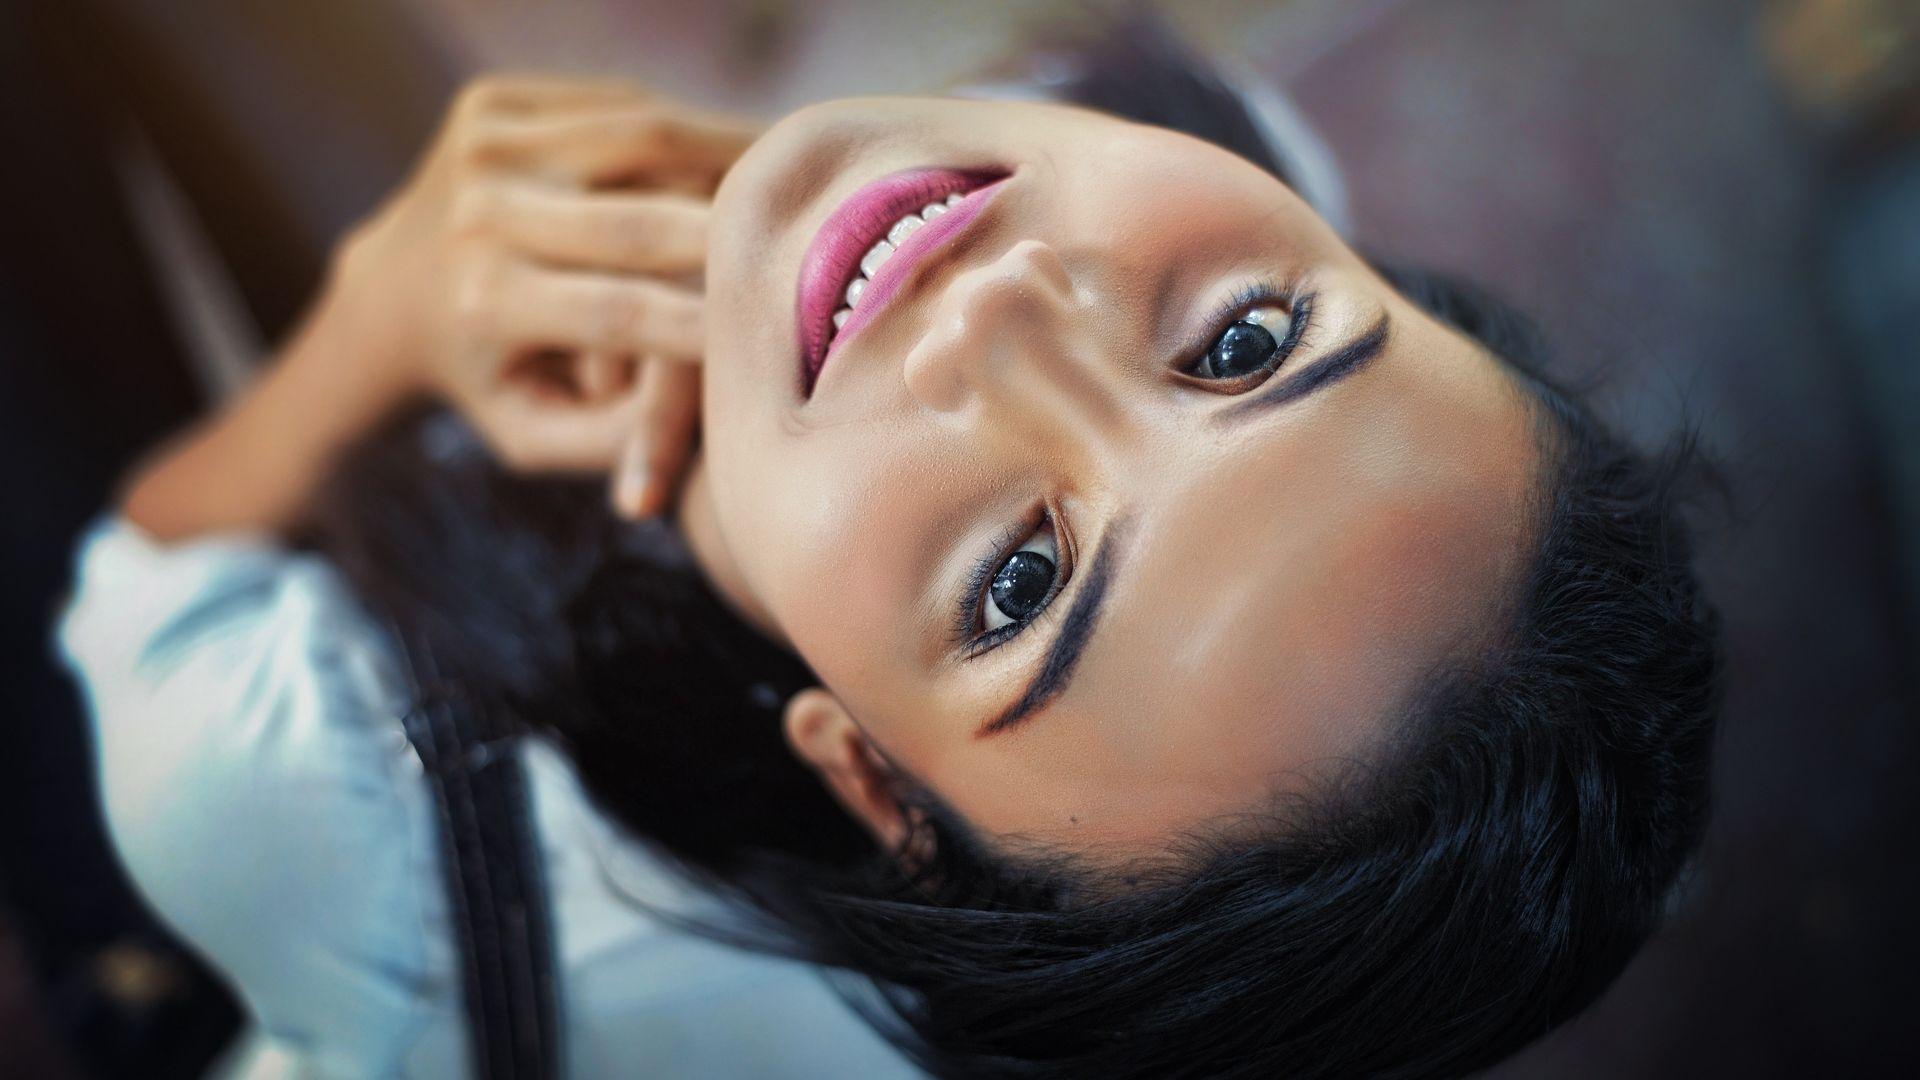 Wallpaper Face, girl, close up, 4k